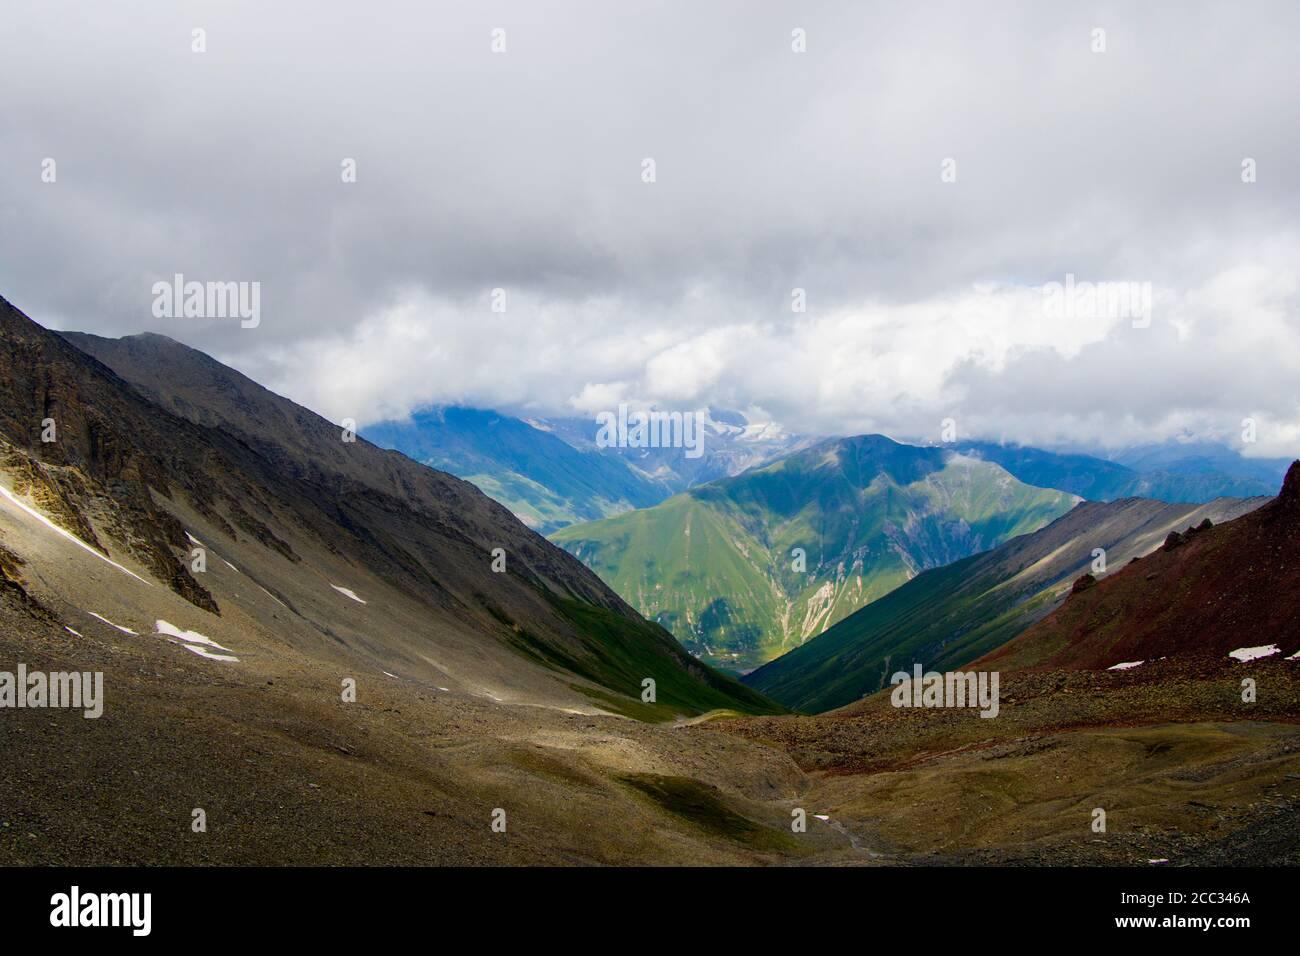 Amazing and beautiful mountain range landscape, peak and hill in Georgia. Stock Photo